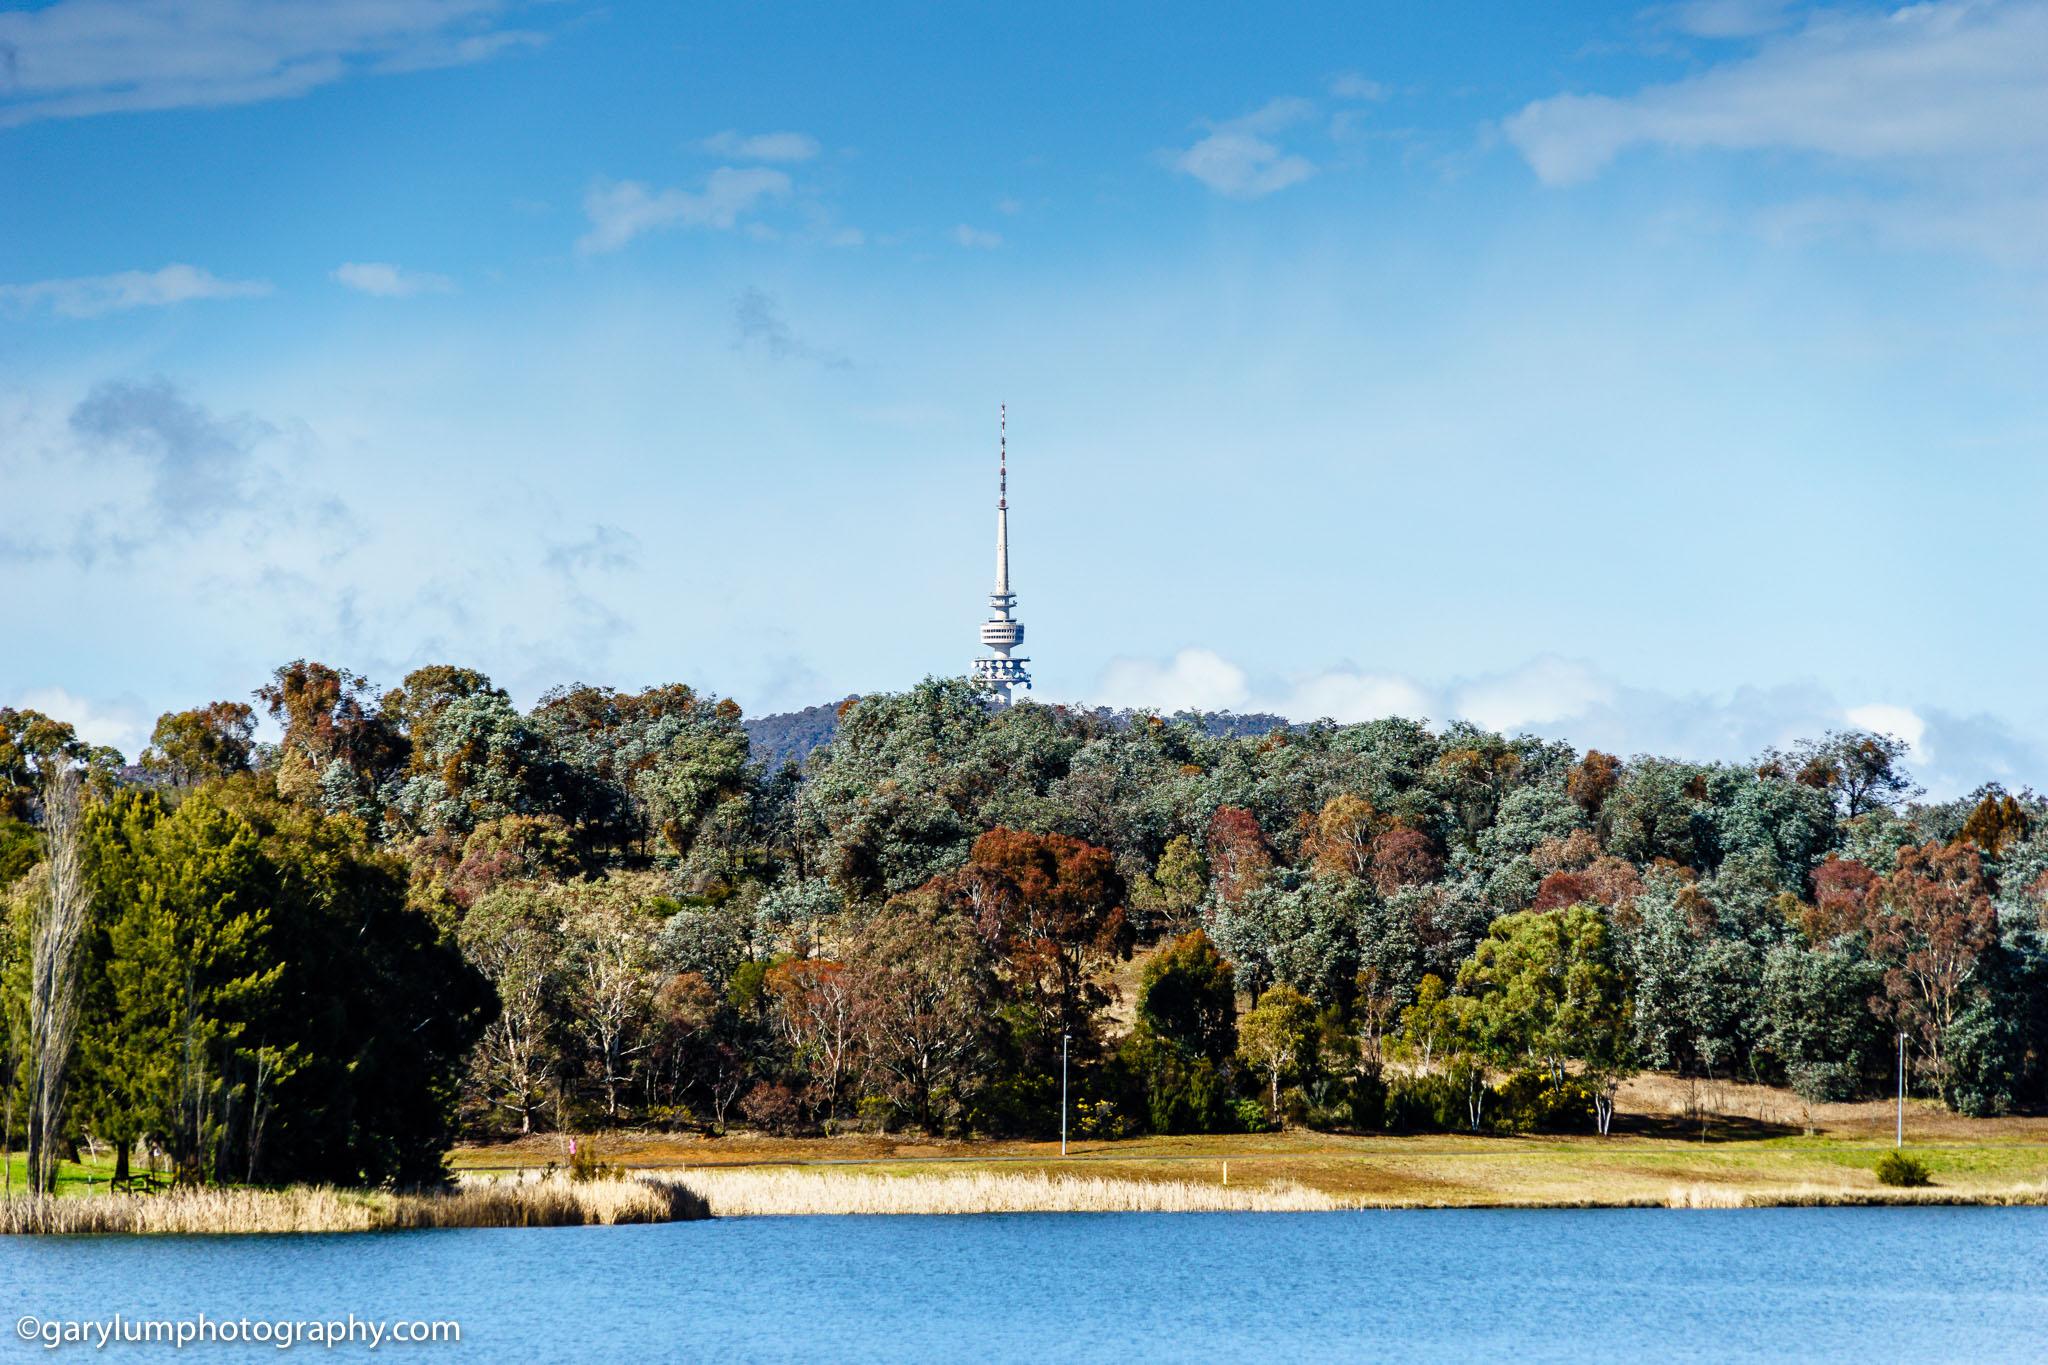 Lake Ginninderra and Telstra Tower